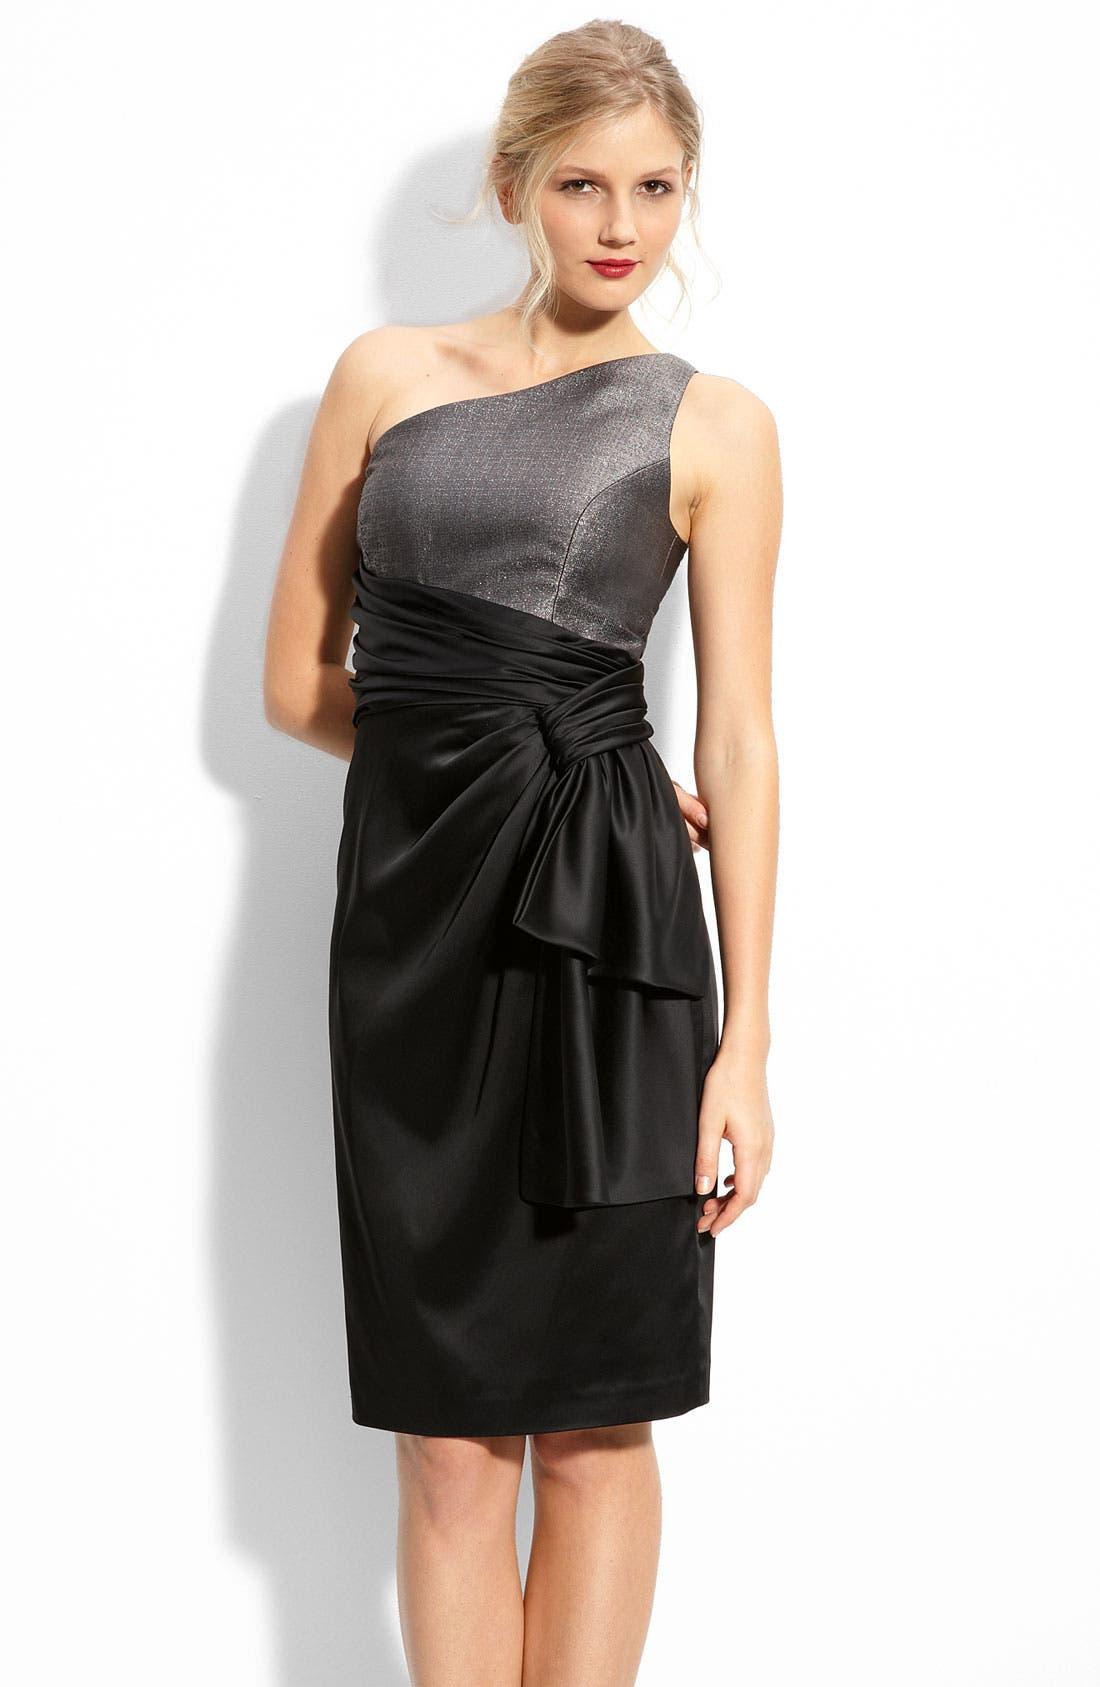 Alternate Image 1 Selected - Maggy London One Shoulder Jacquard & Stretch Satin Dress